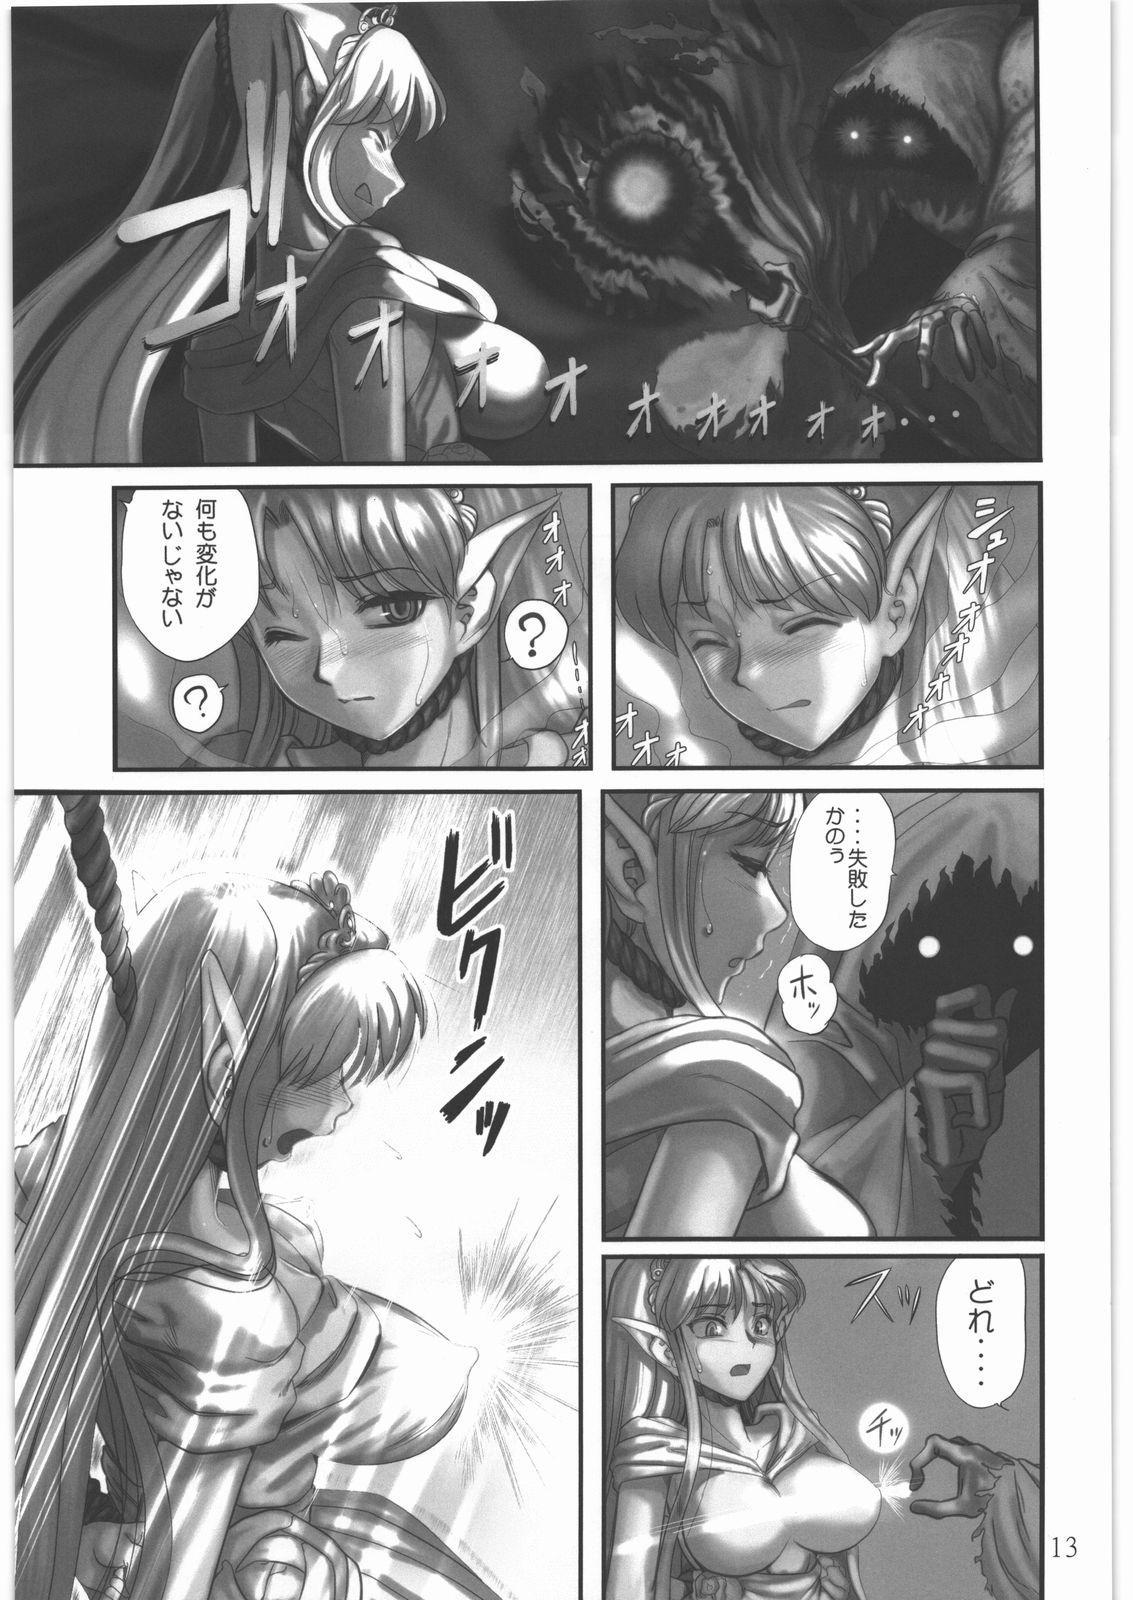 Elf Ryoujoku 11